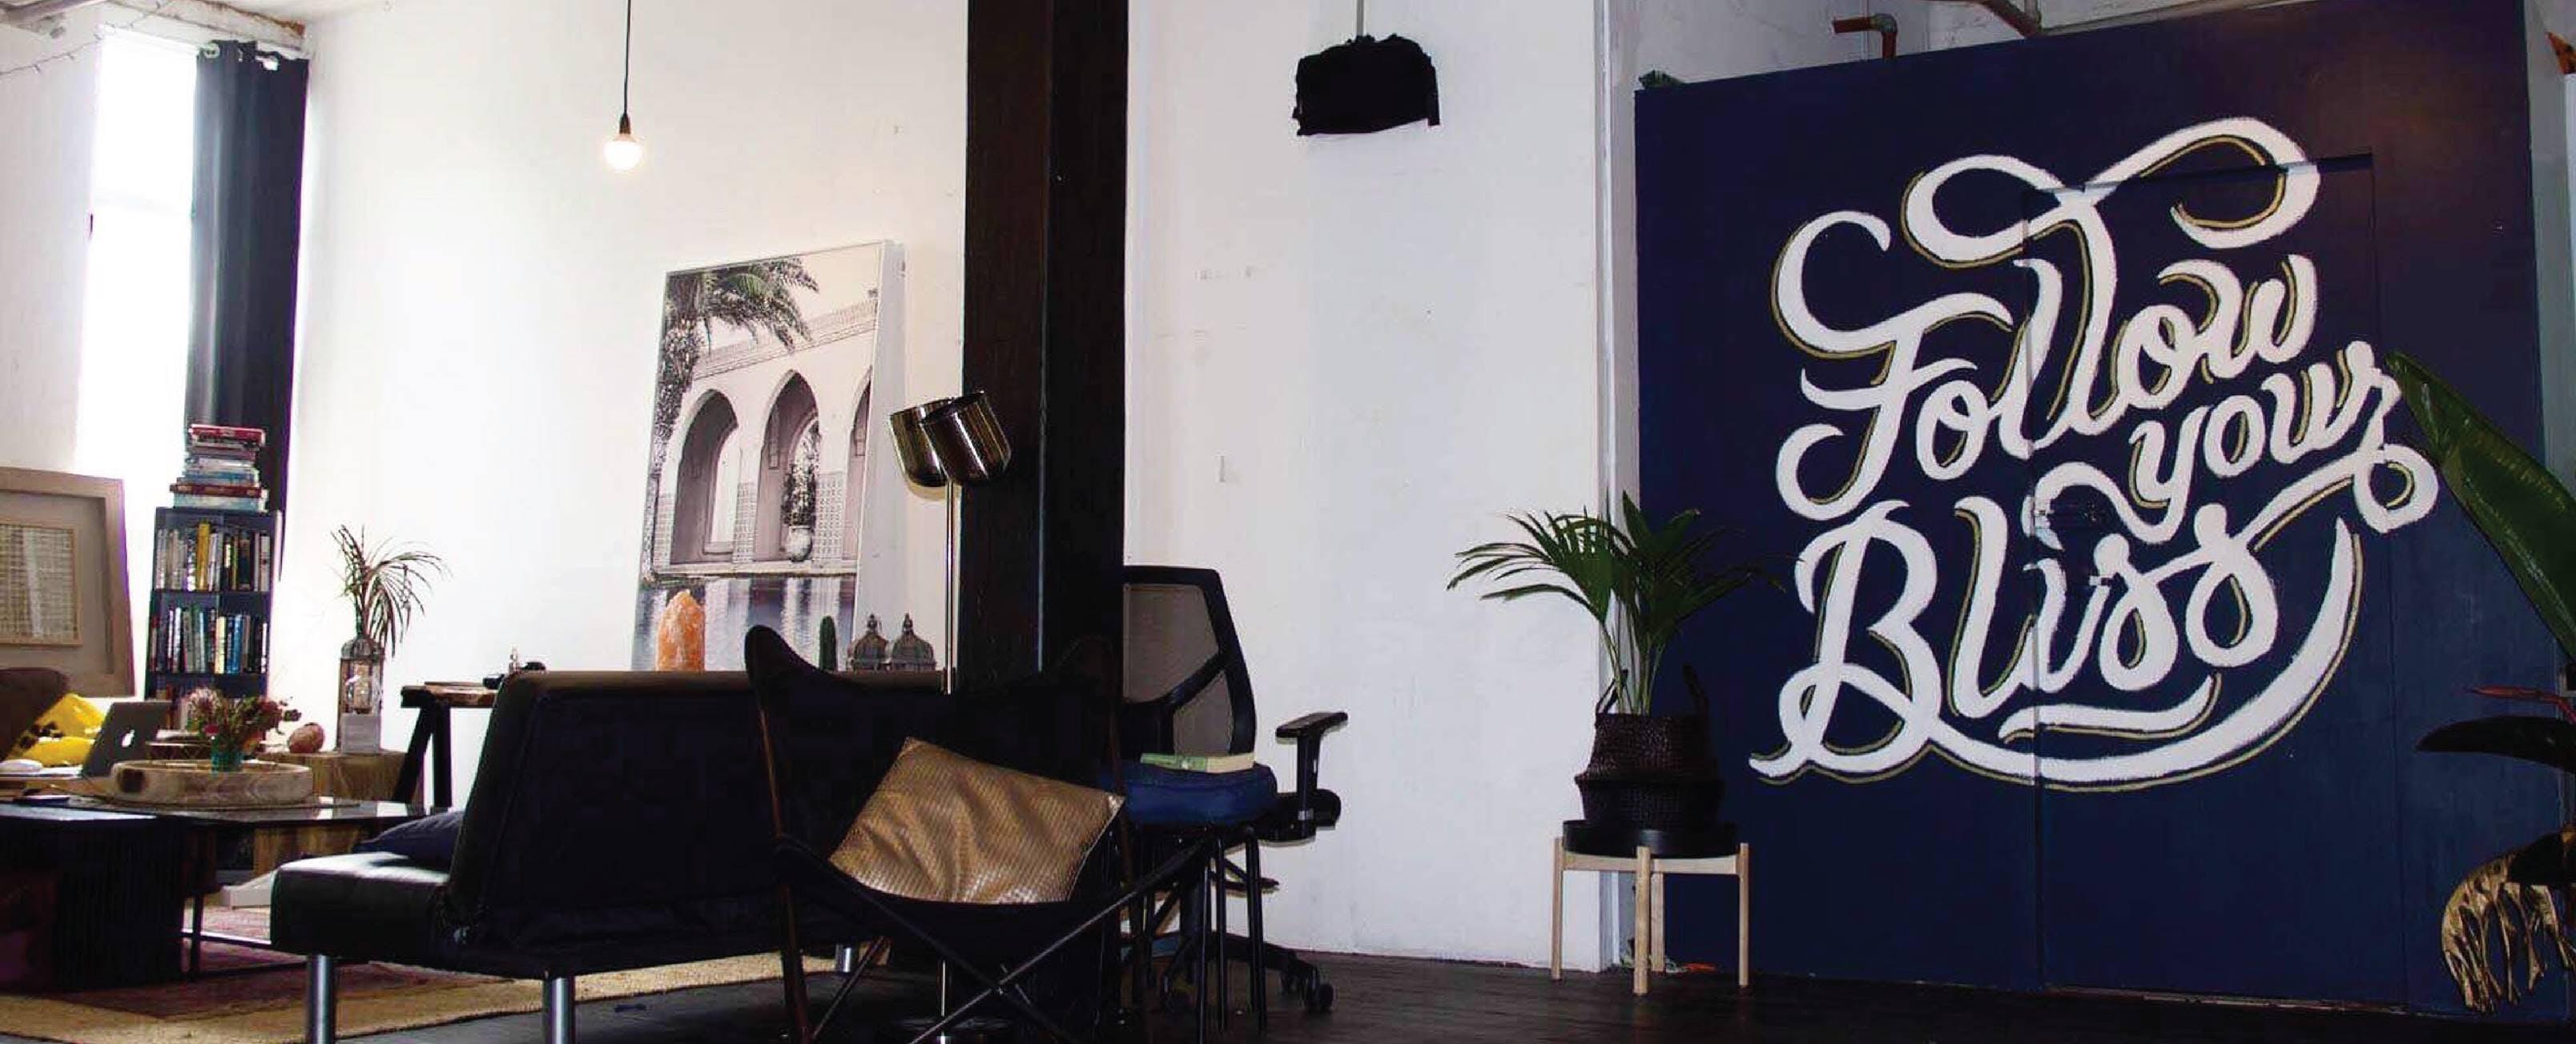 Studio Blueprint - Events Space Hire, multi-use area at Studio Blueprint - Events space, image 1